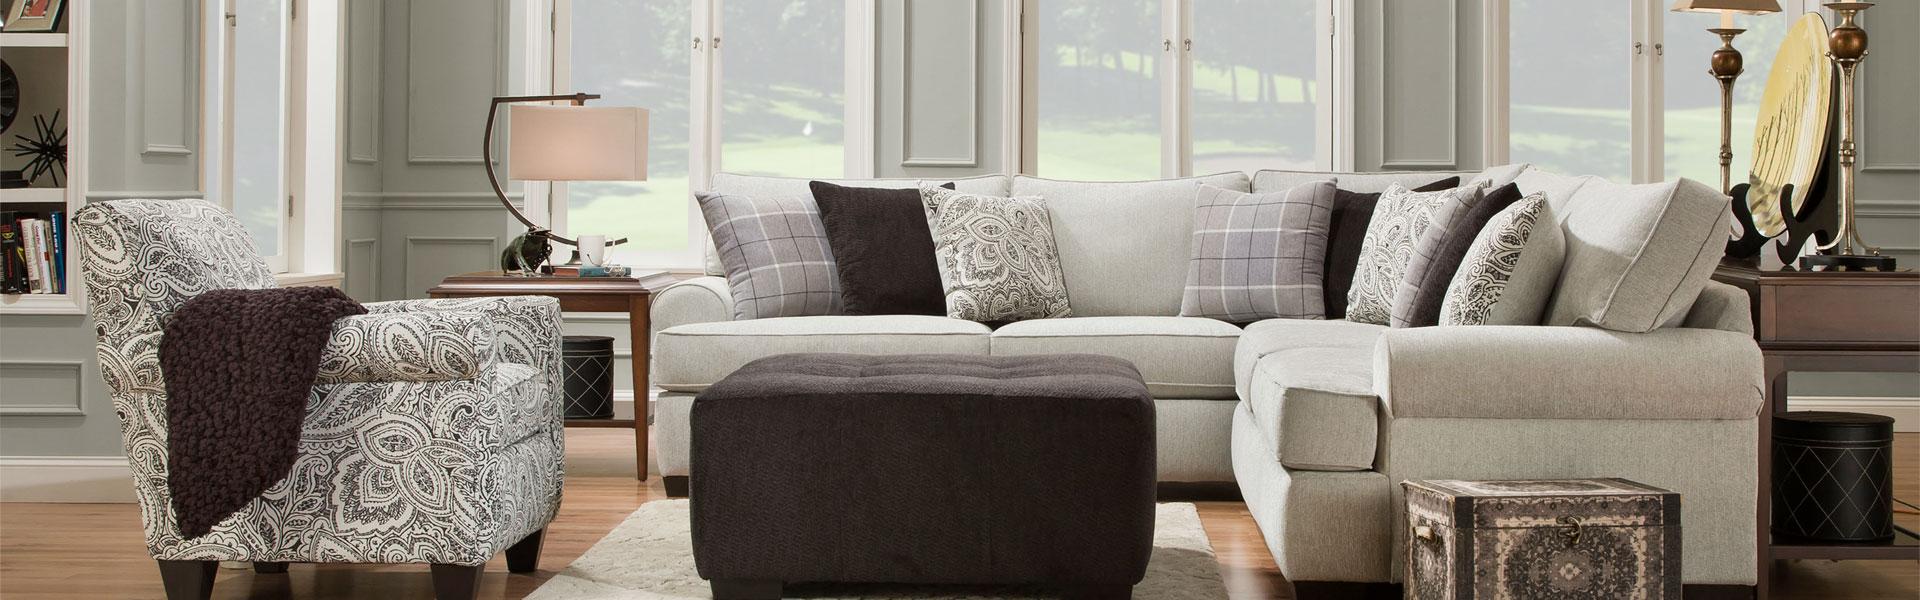 home kutter 39 s america s furniture store. Black Bedroom Furniture Sets. Home Design Ideas